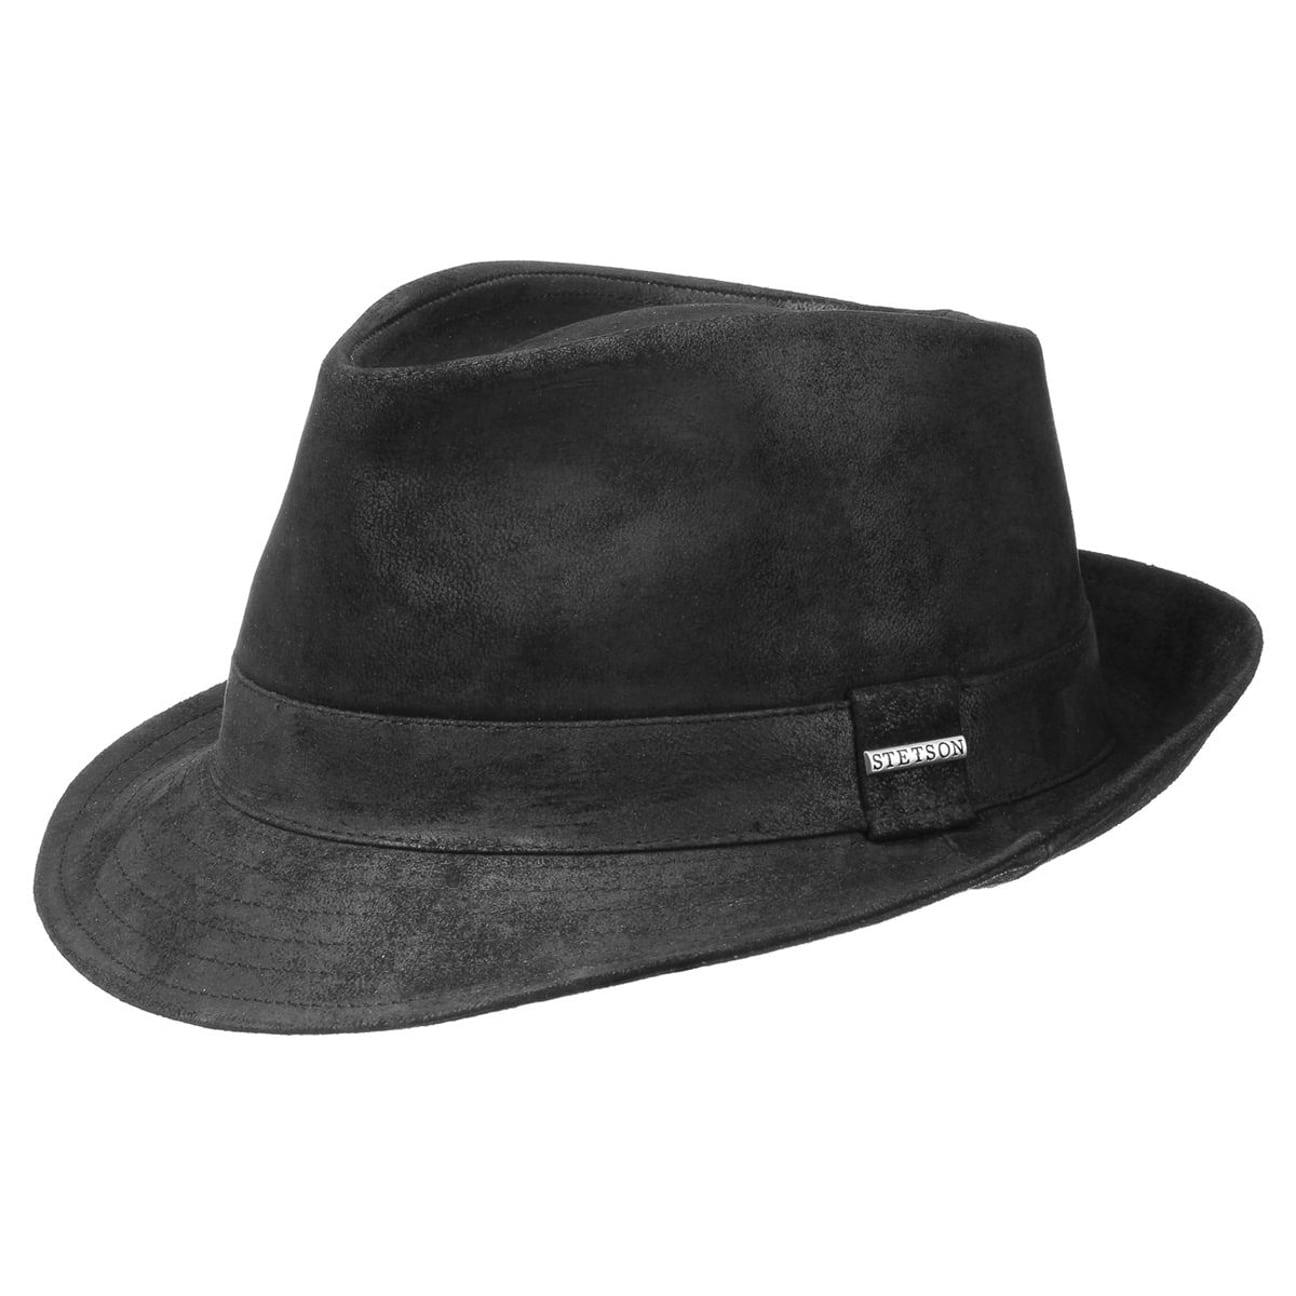 4c27b2887a2 ... Medula Pigskin Hat by Stetson - black 3